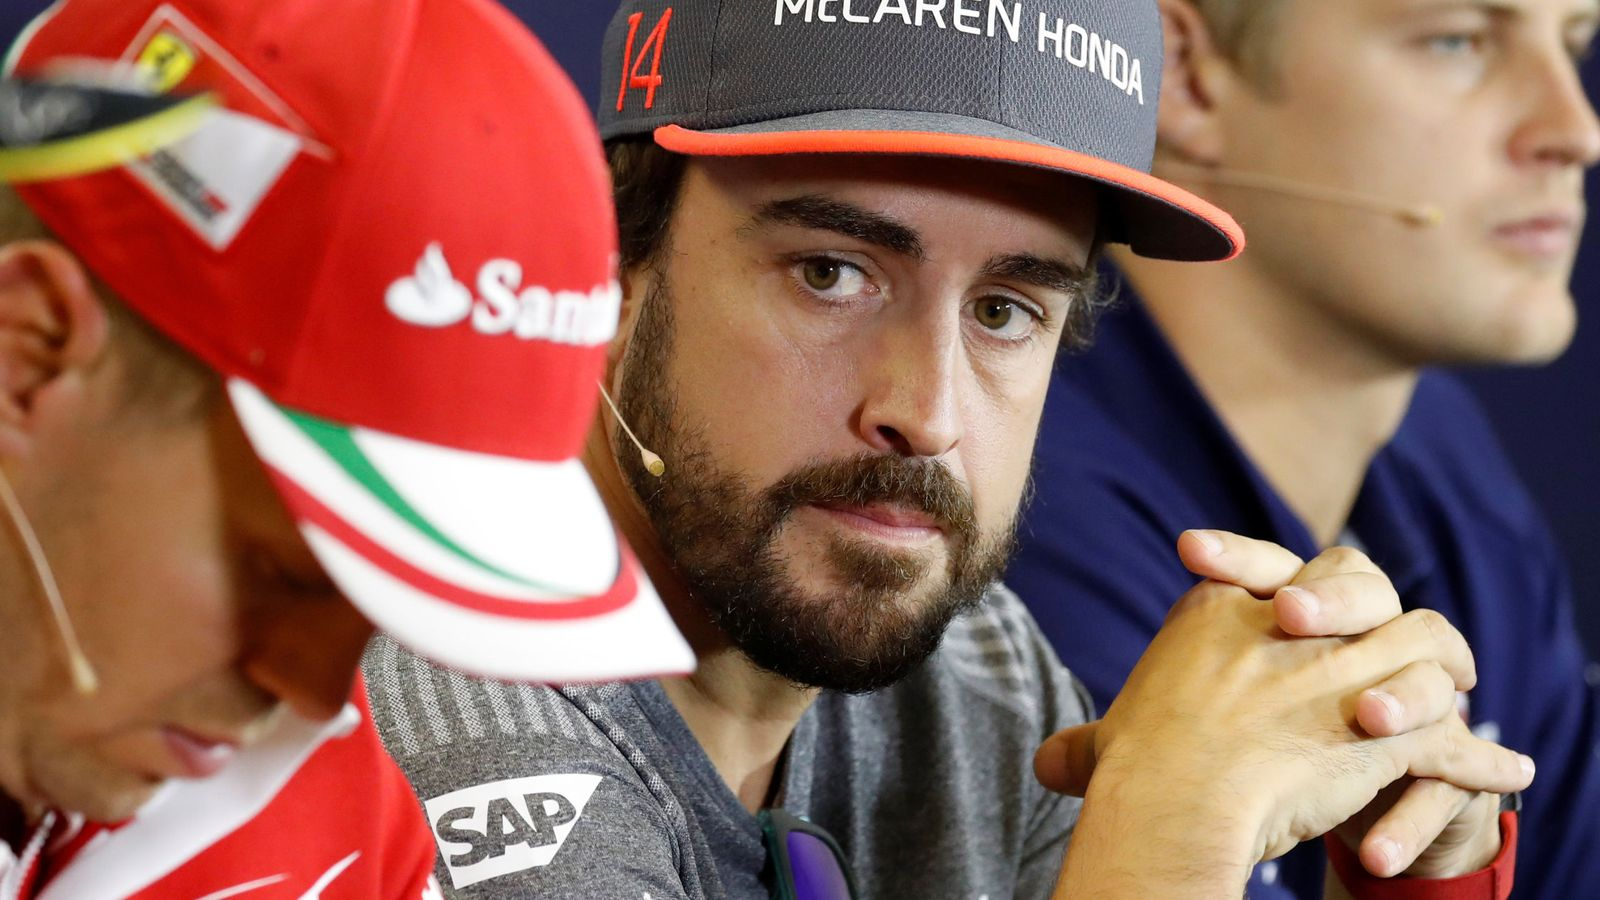 Foto: La vuelta de Alonso a la F1 depende de la decisión de Vettel. (Reuters)